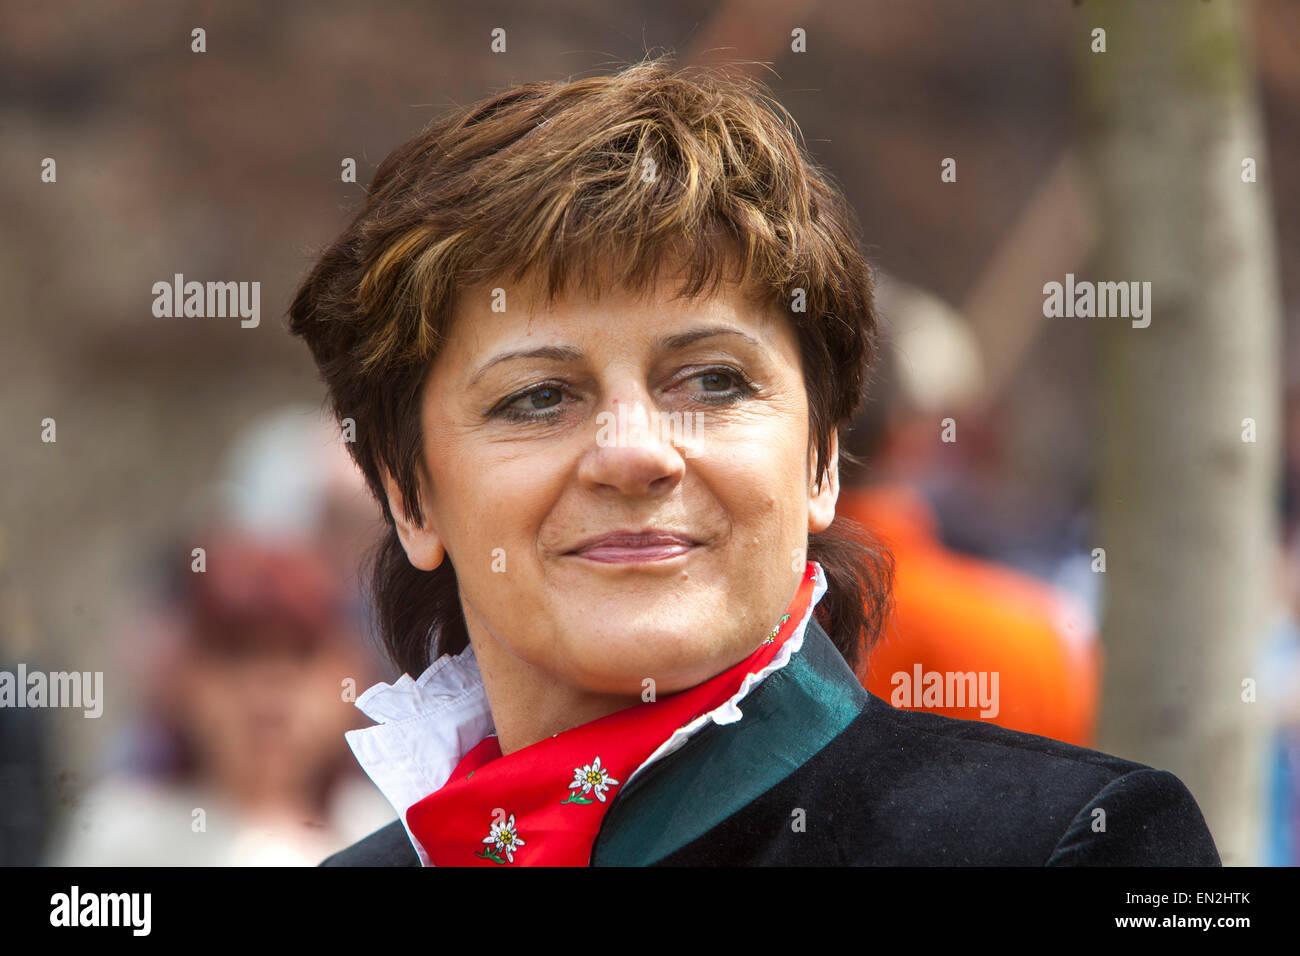 Nina Novakova, Member of Parliament, TOP09 - Stock Image